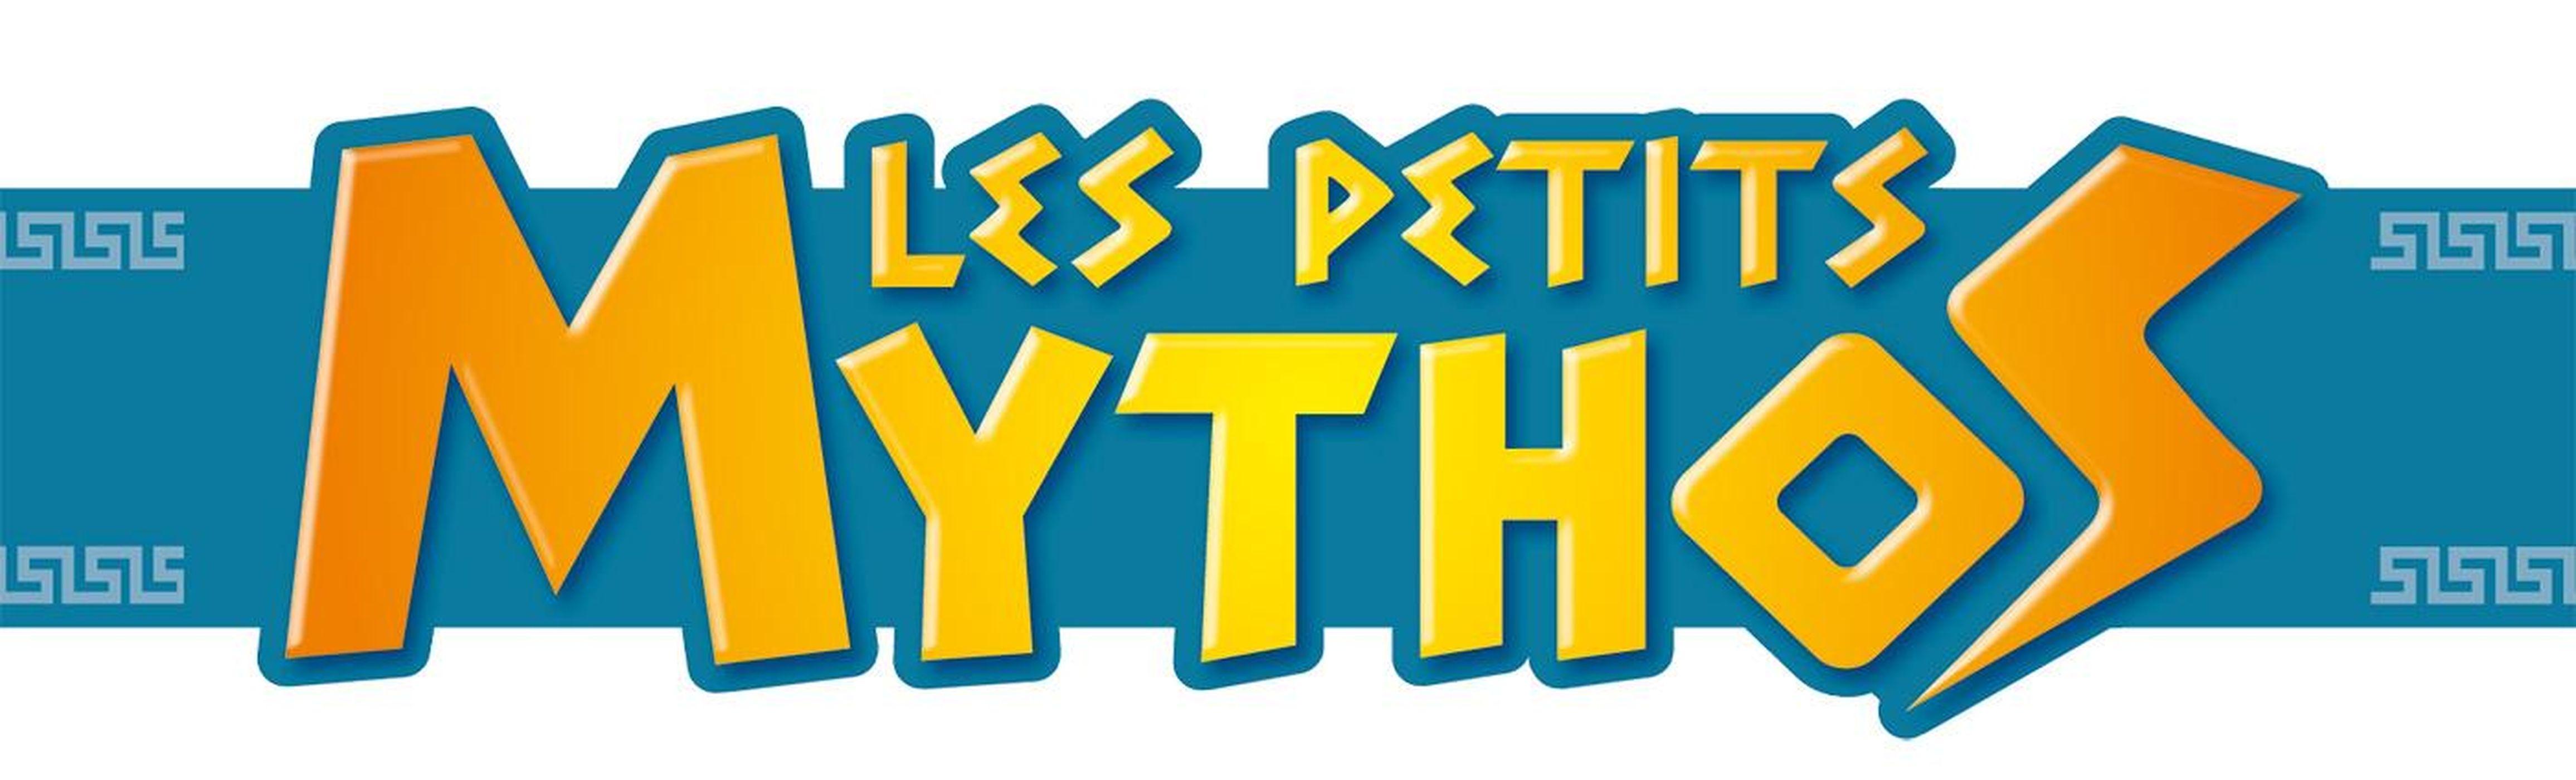 PACK 10 EX. FONDS - LES PETITS MYTHOS